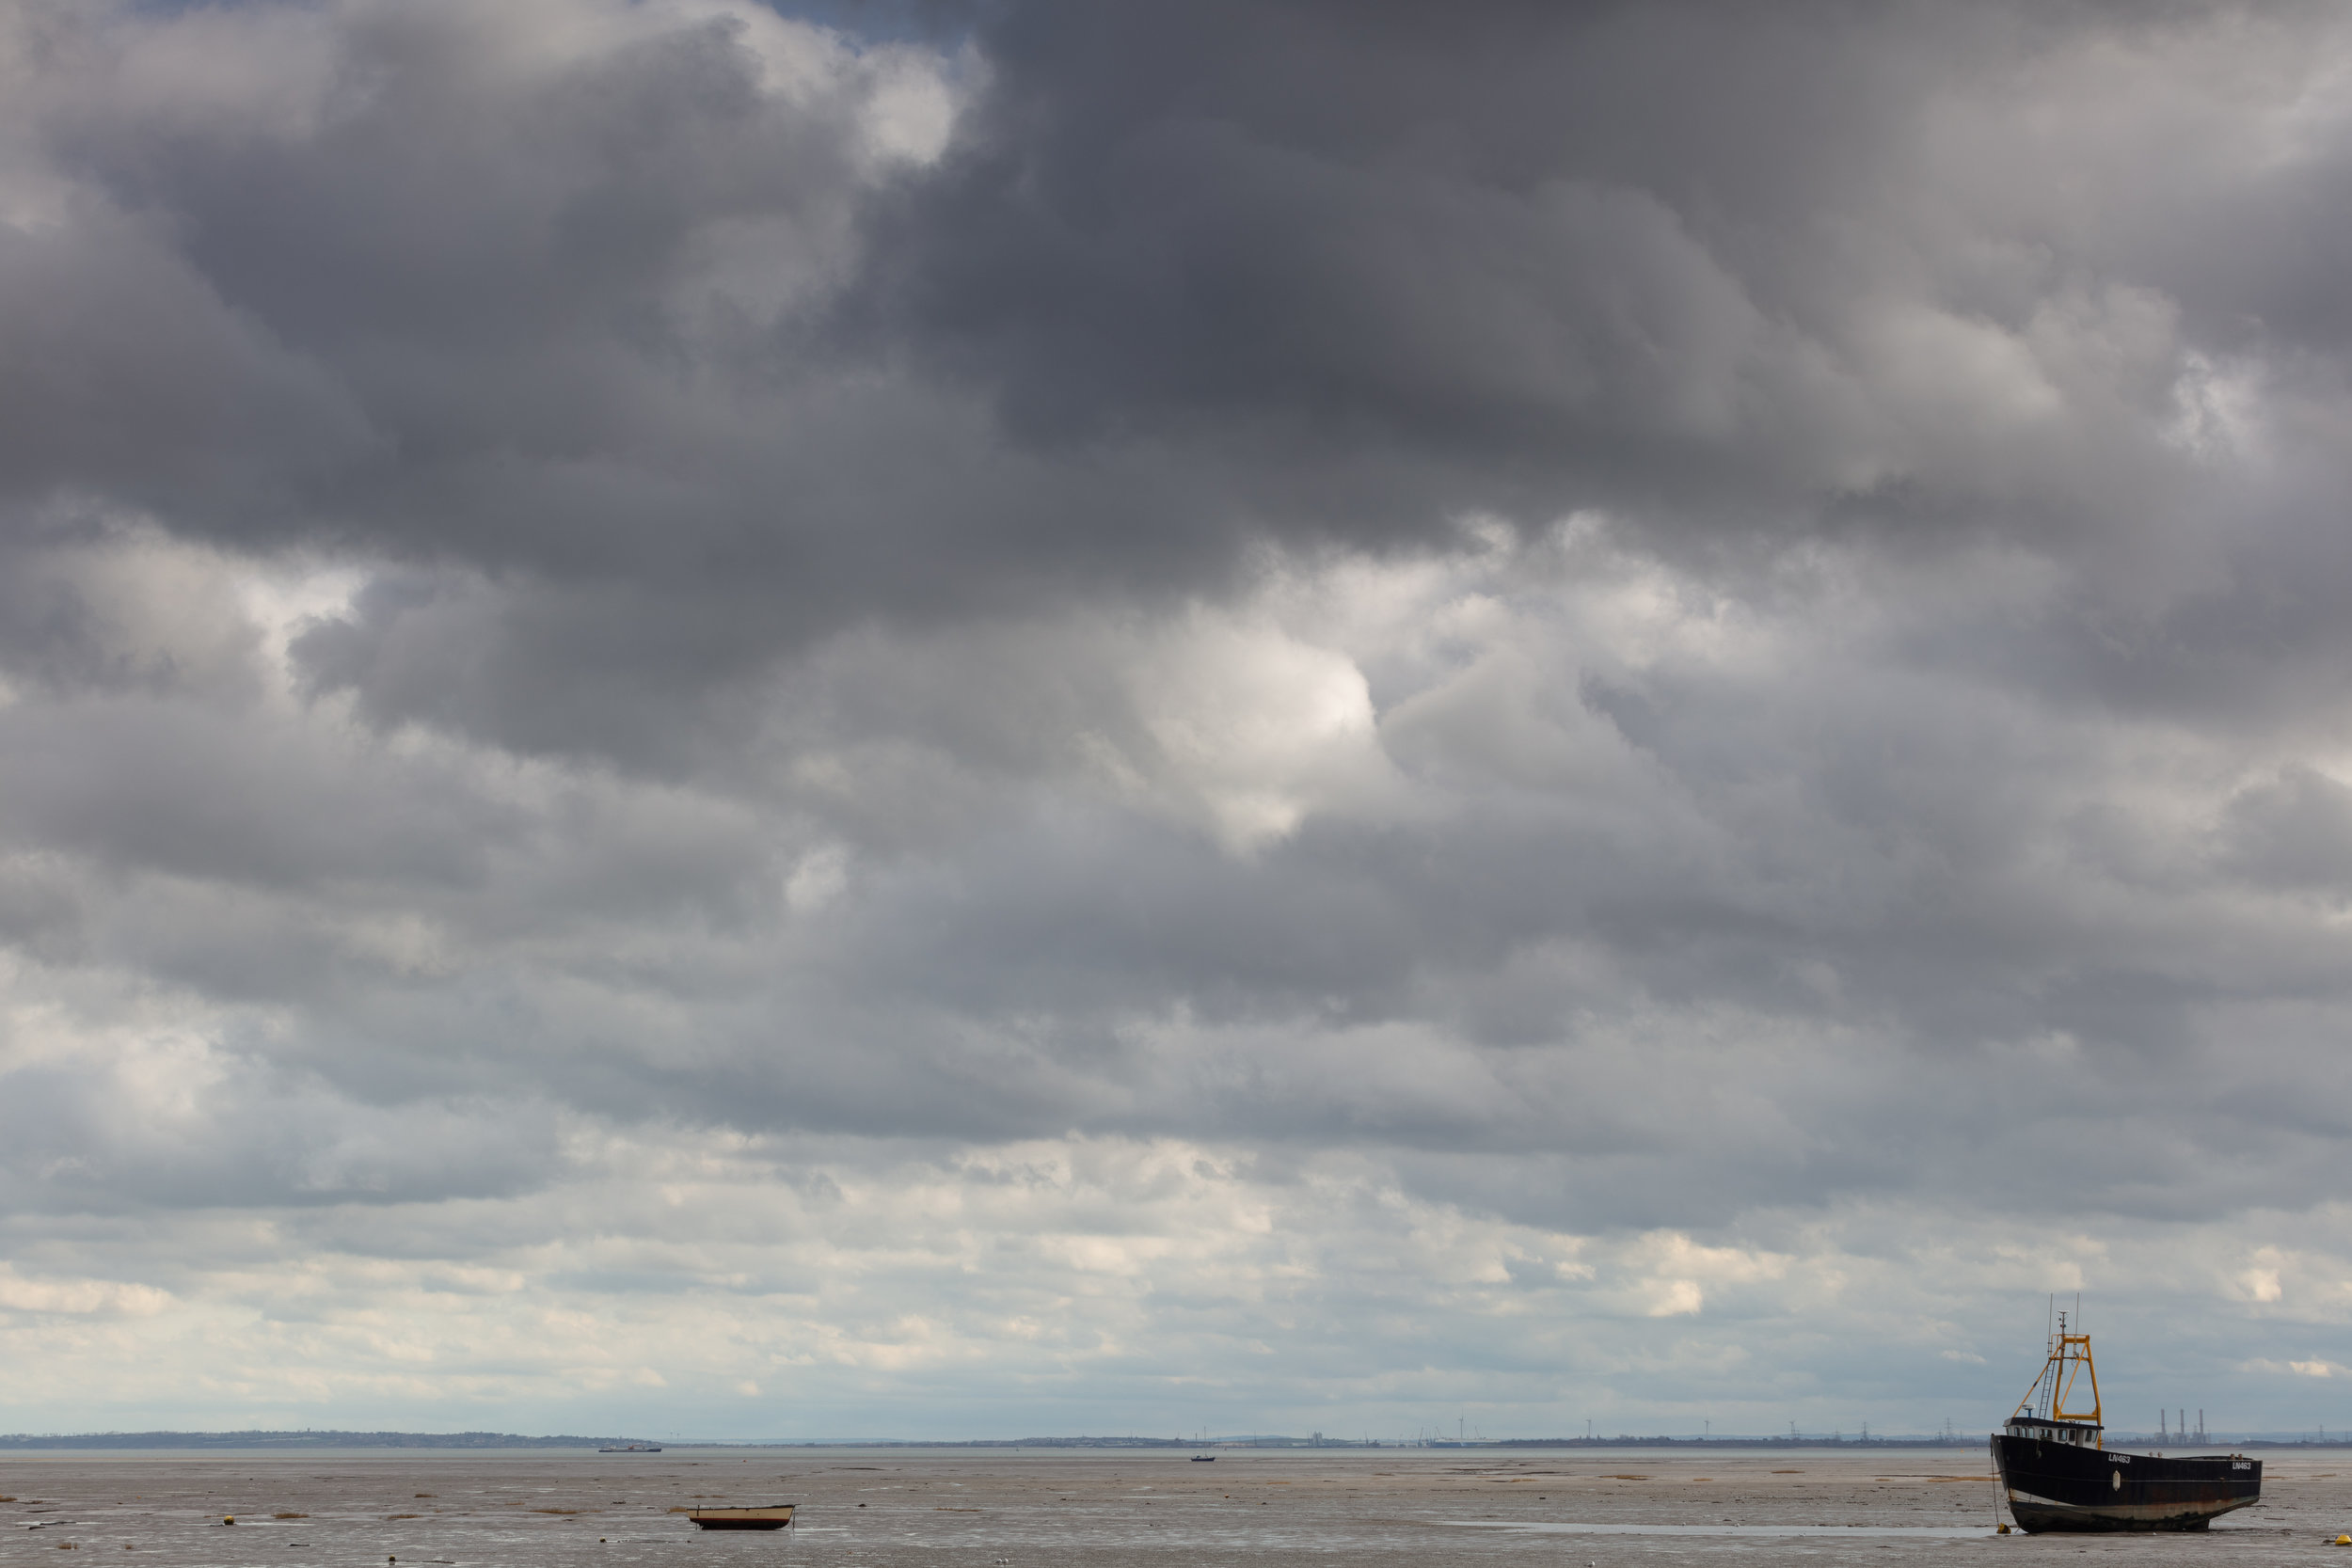 Bigger skies, Leigh-on-sea, Essex.